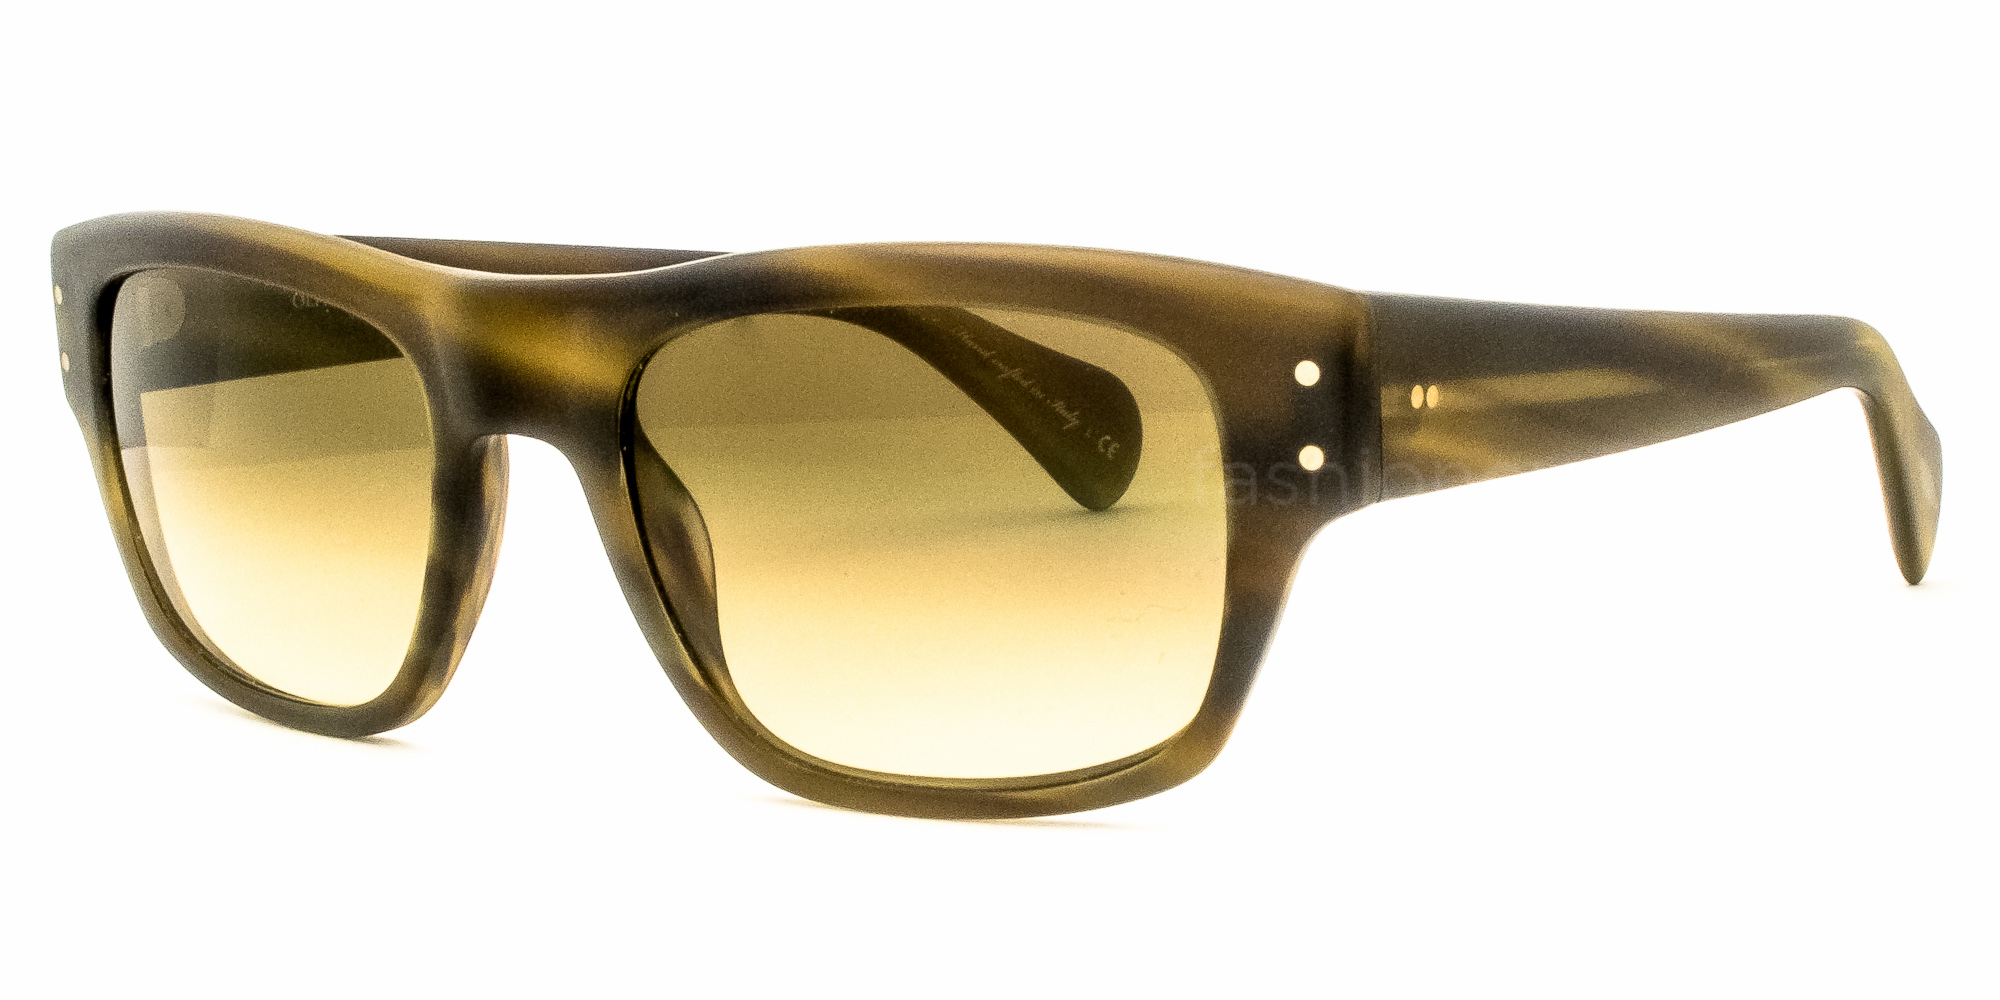 d7532c9030 Oliver Peoples EVASON Sunglasses